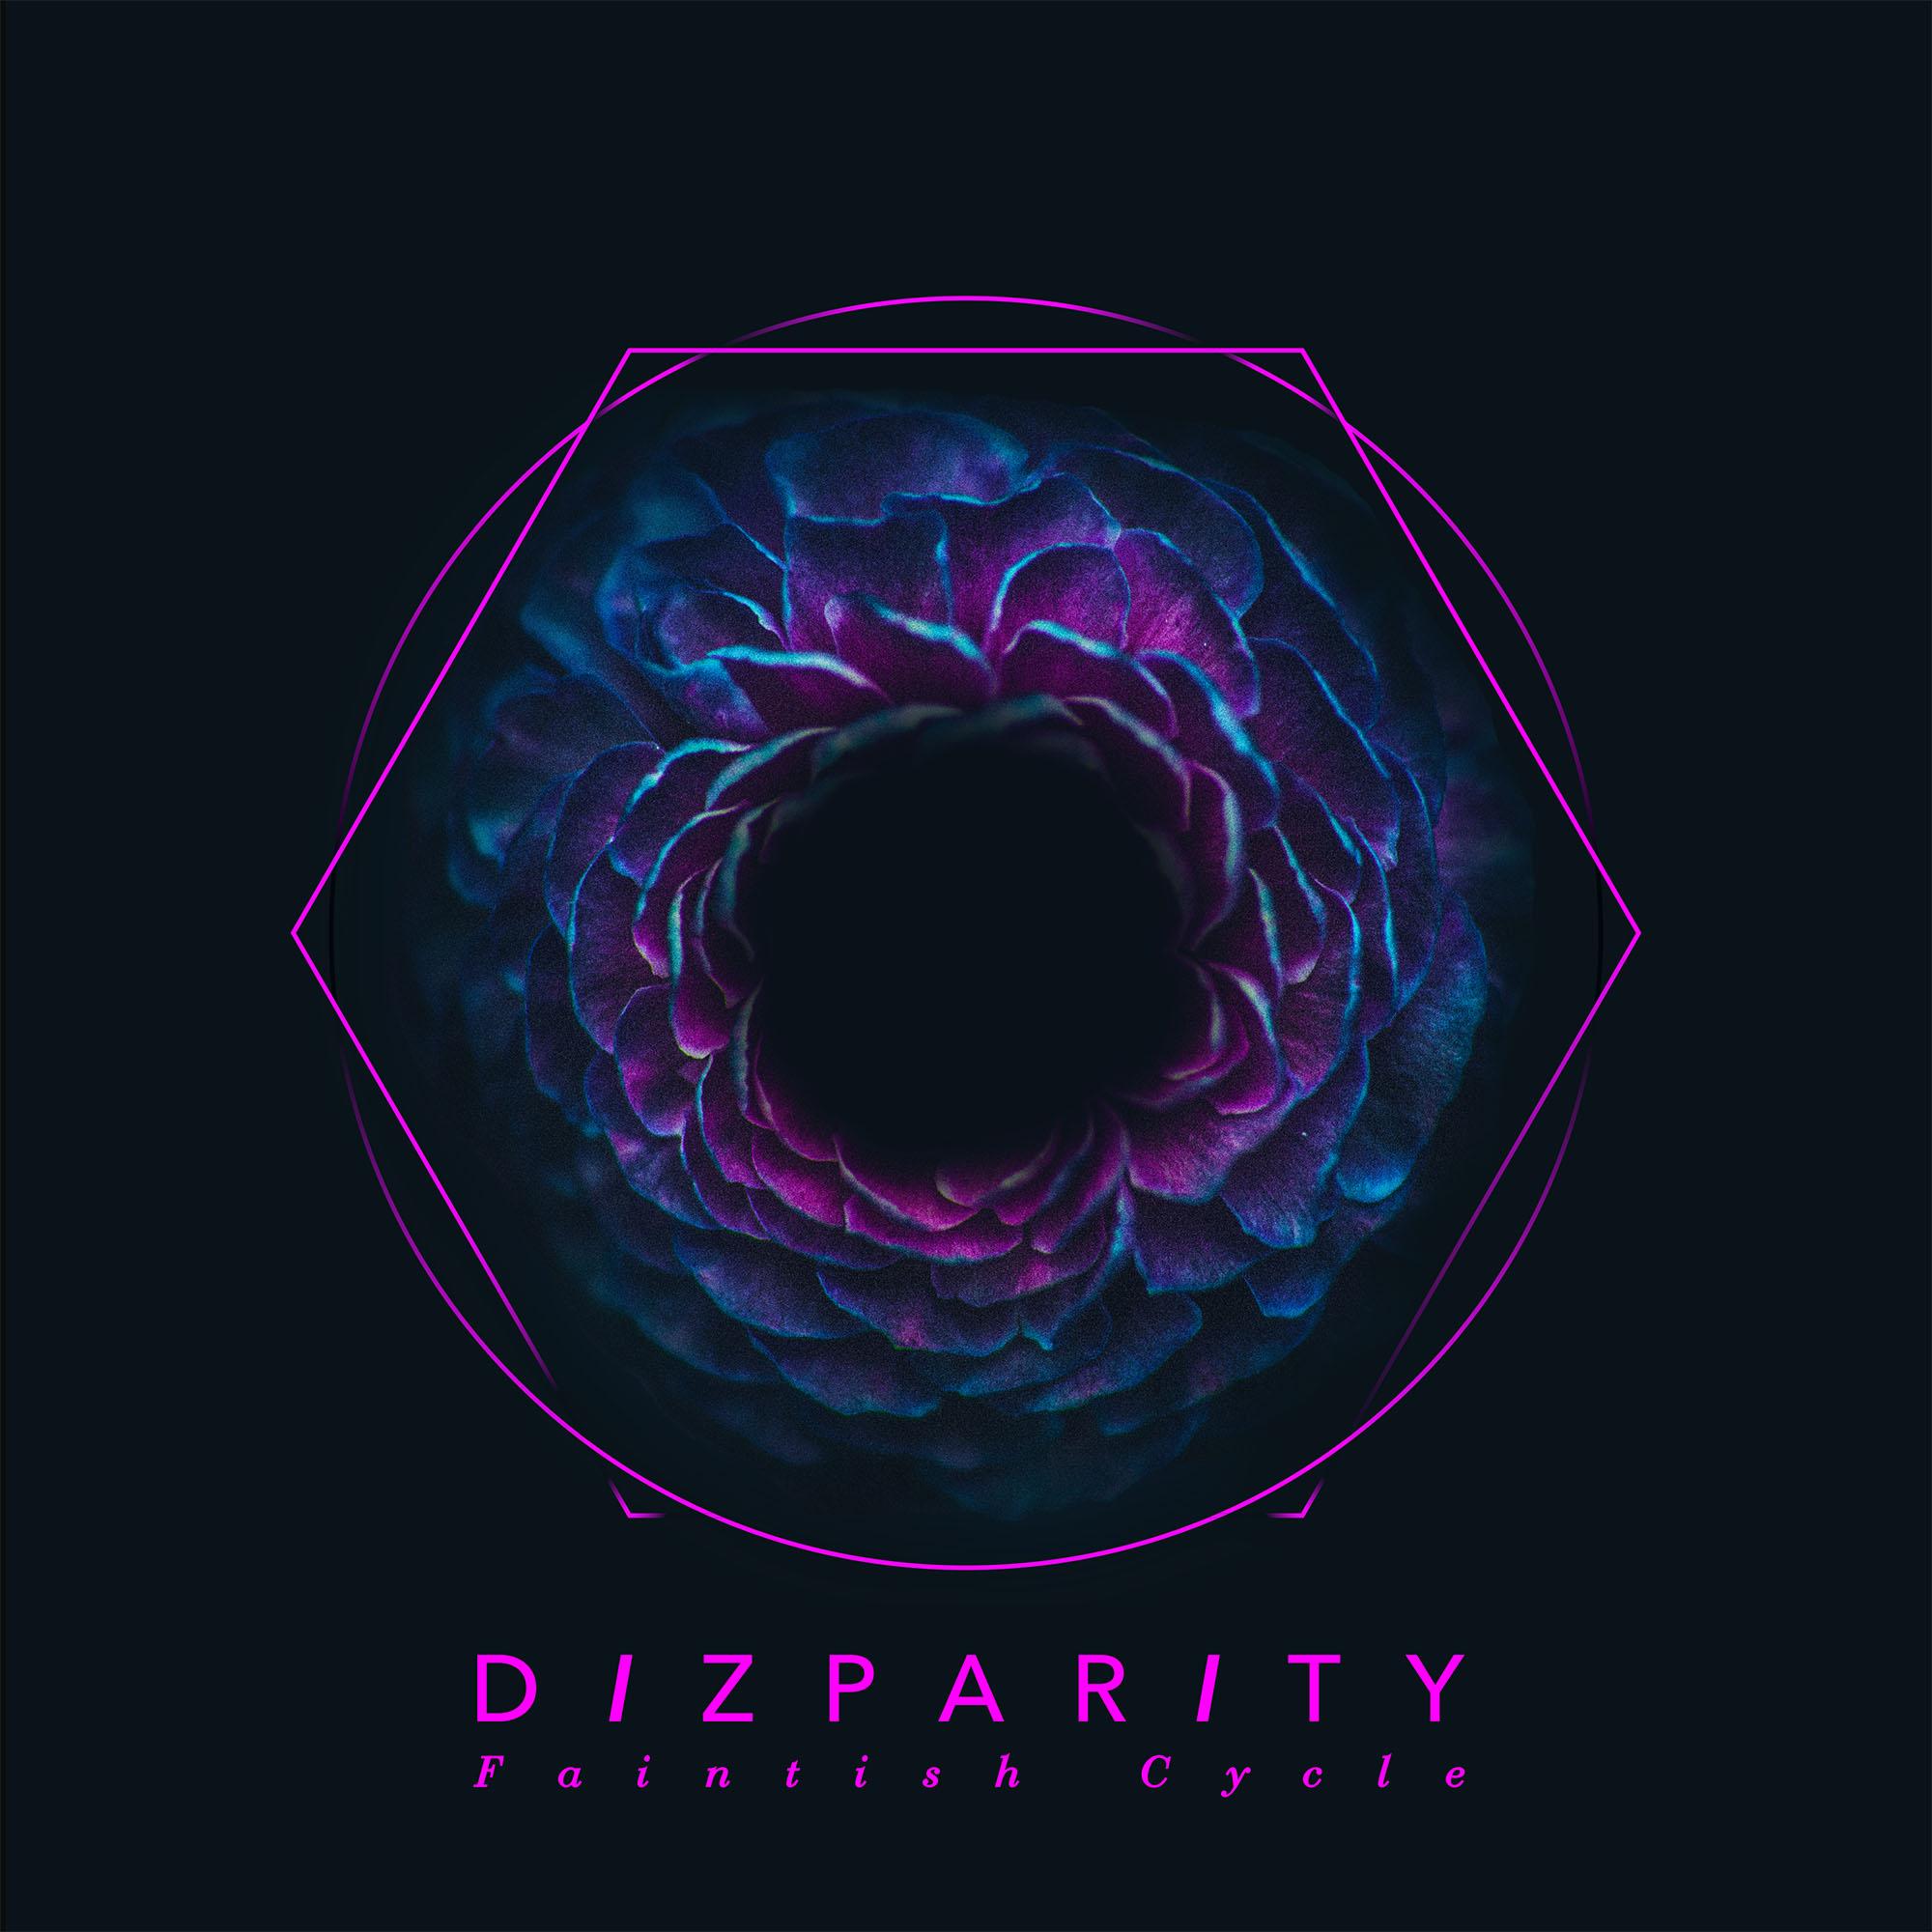 Dizparity - Faintish Cycle